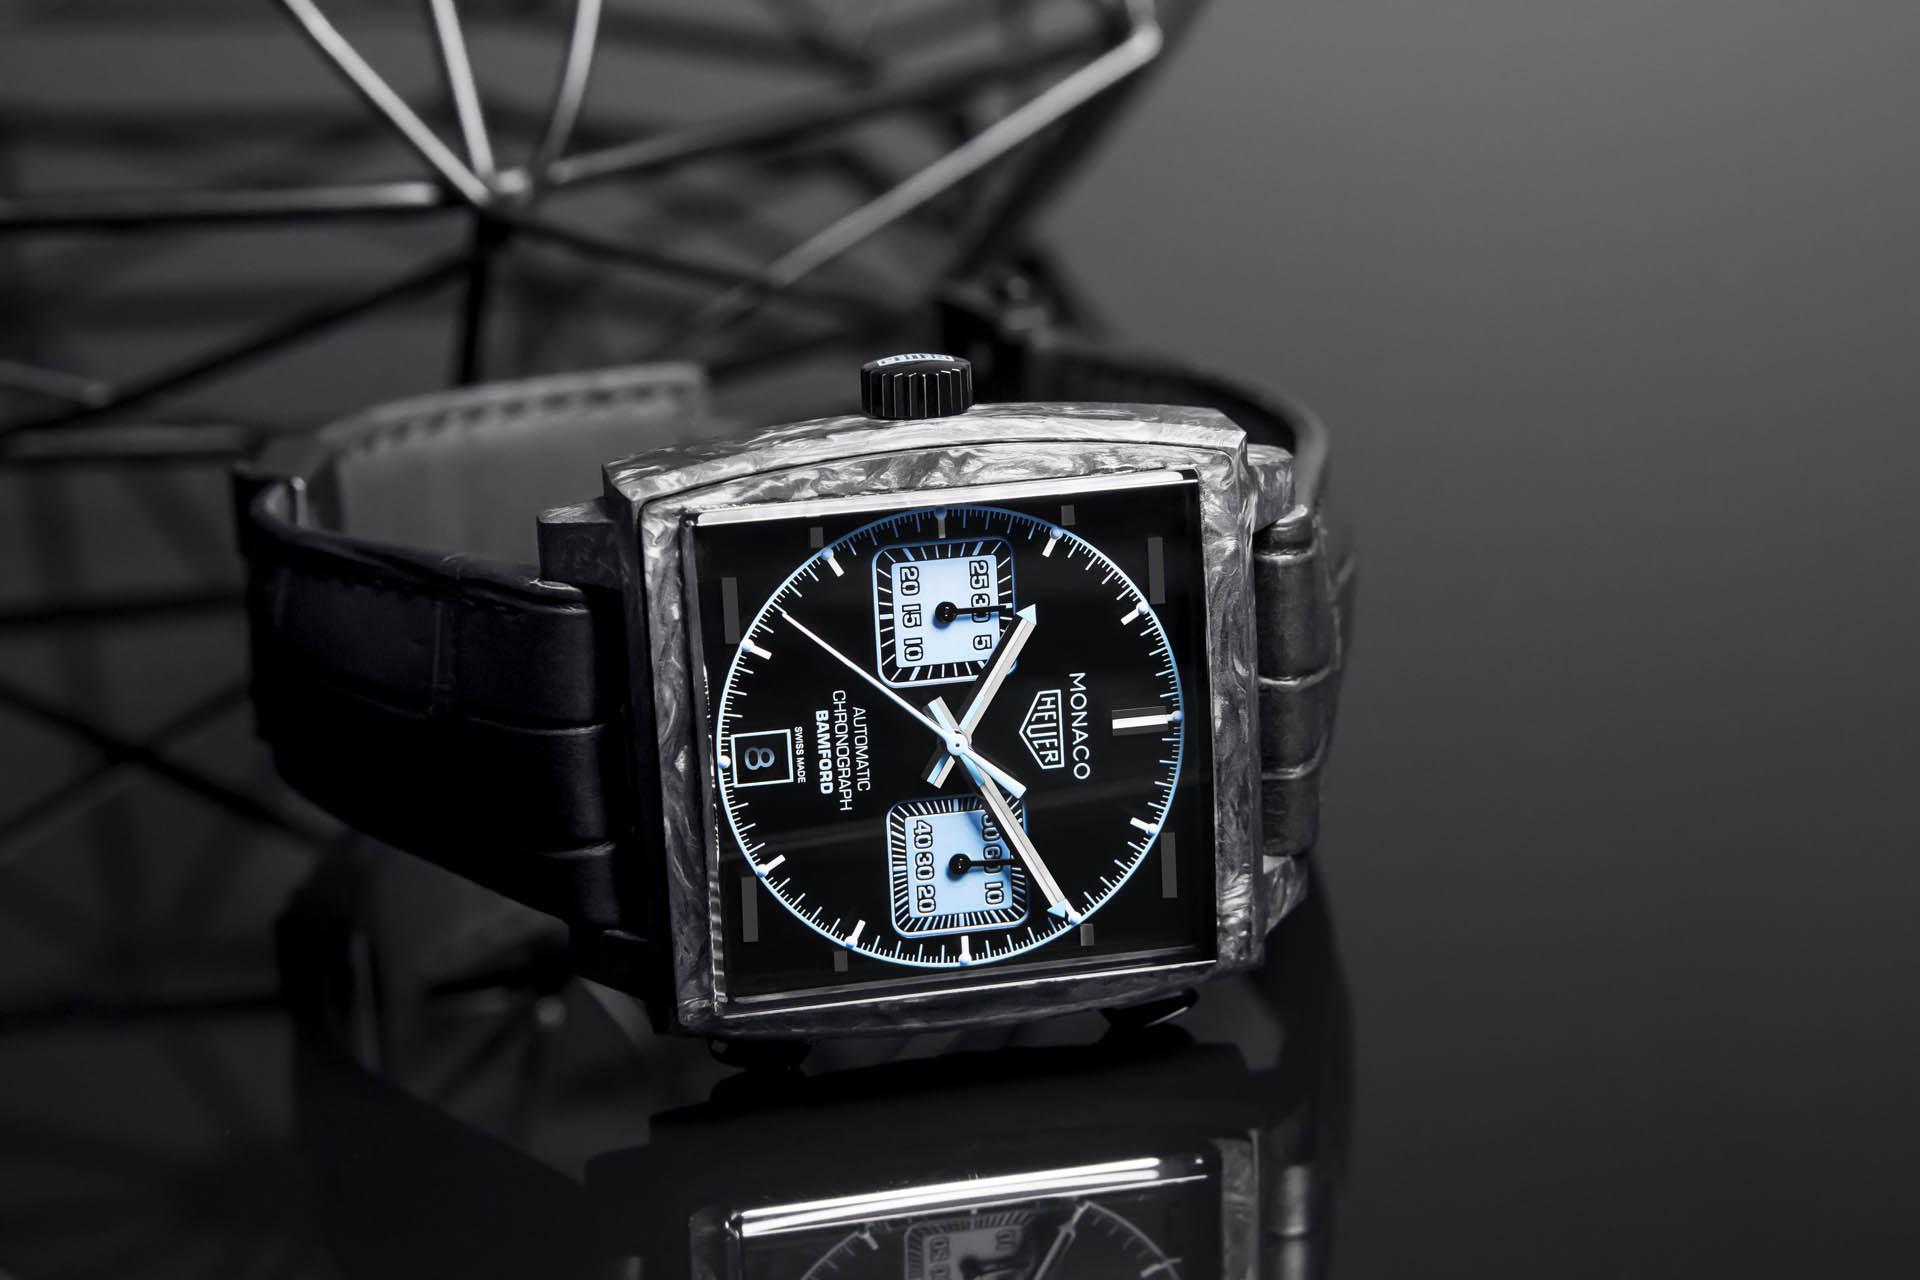 Tag Heuer Monaco Bamford Limited edition (3)